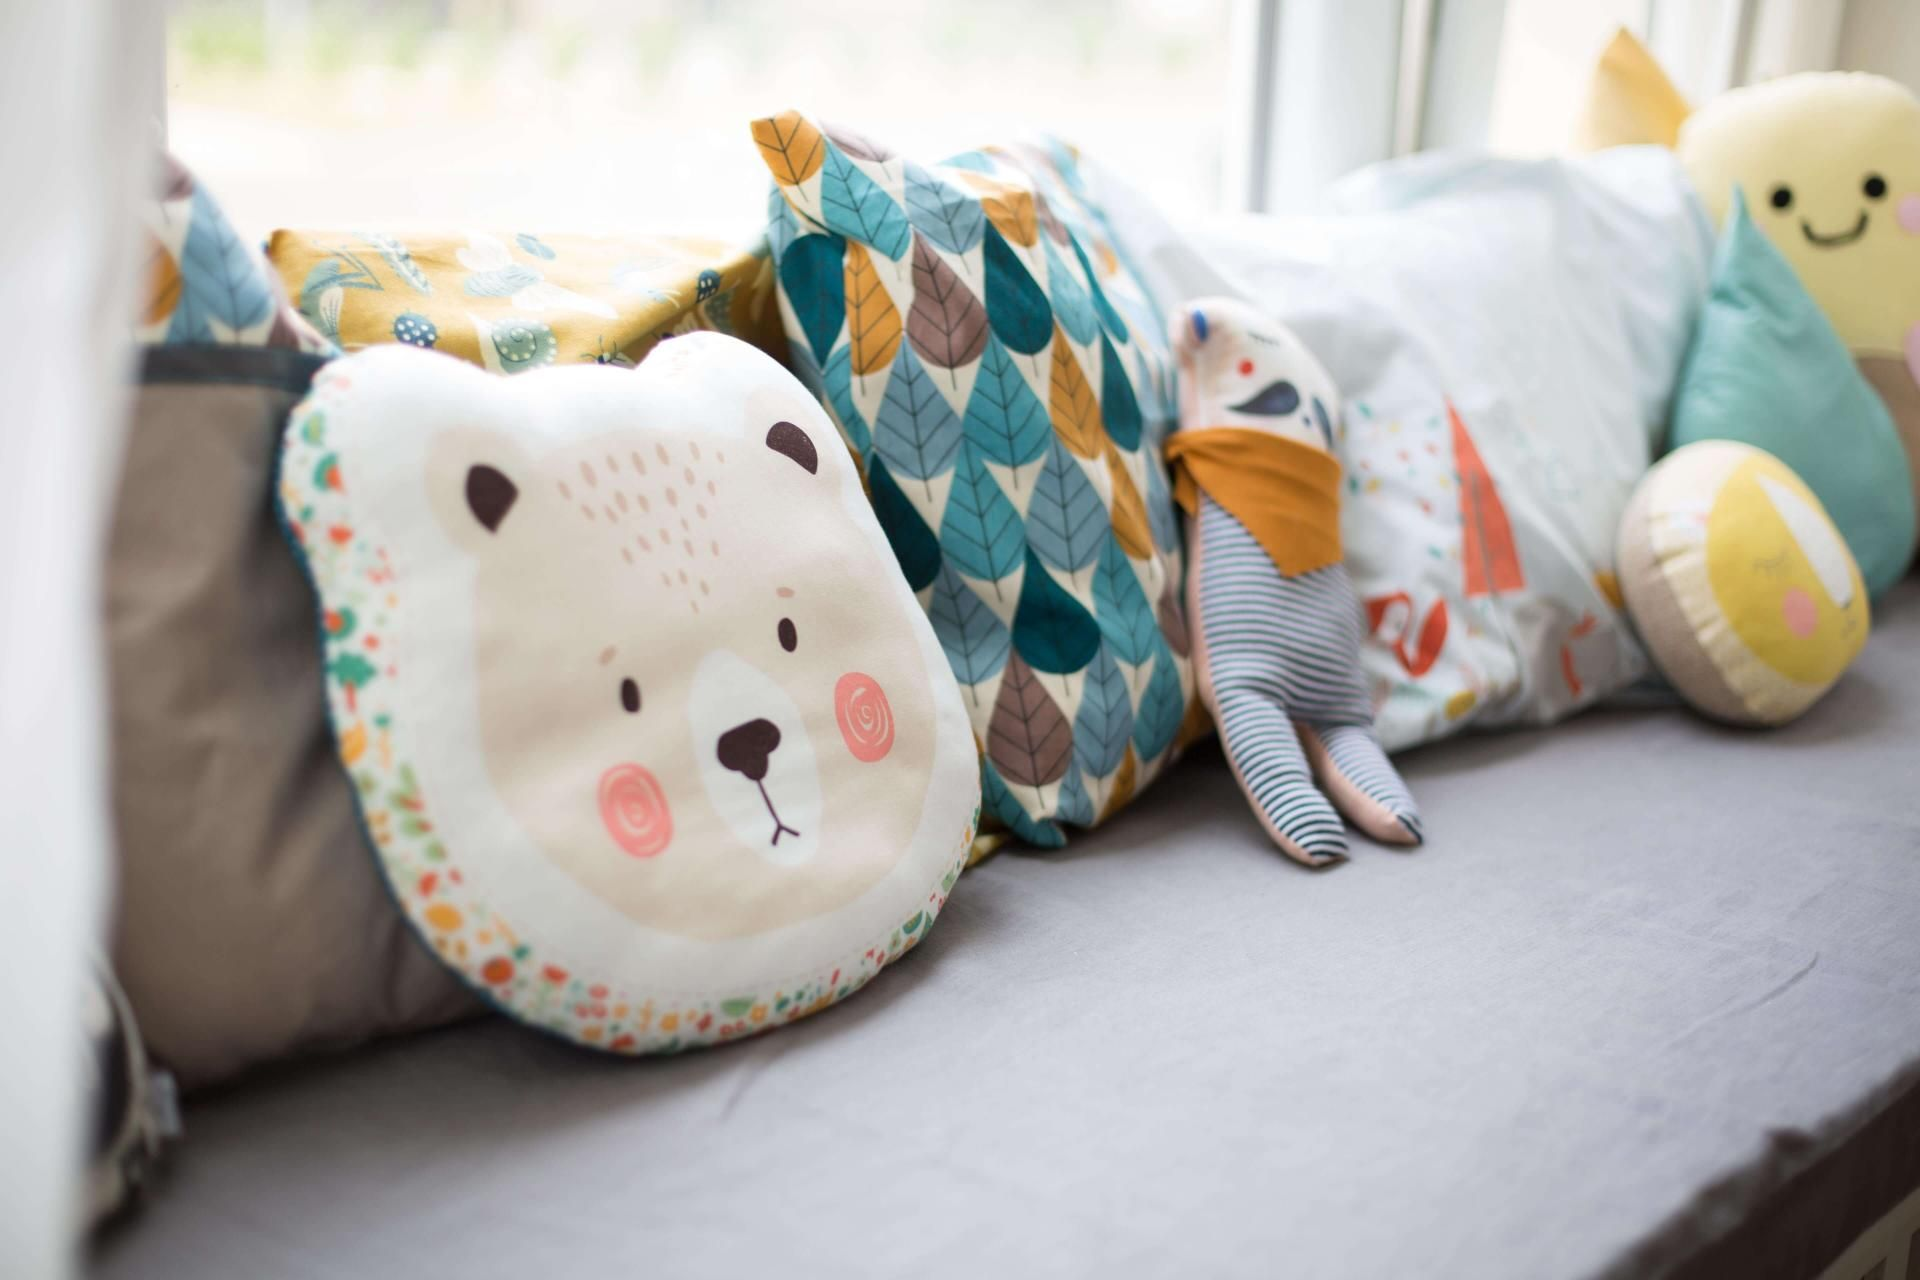 Kinderzimmer Makeover mit DaWanda | Kids rooms, Cozy and Room